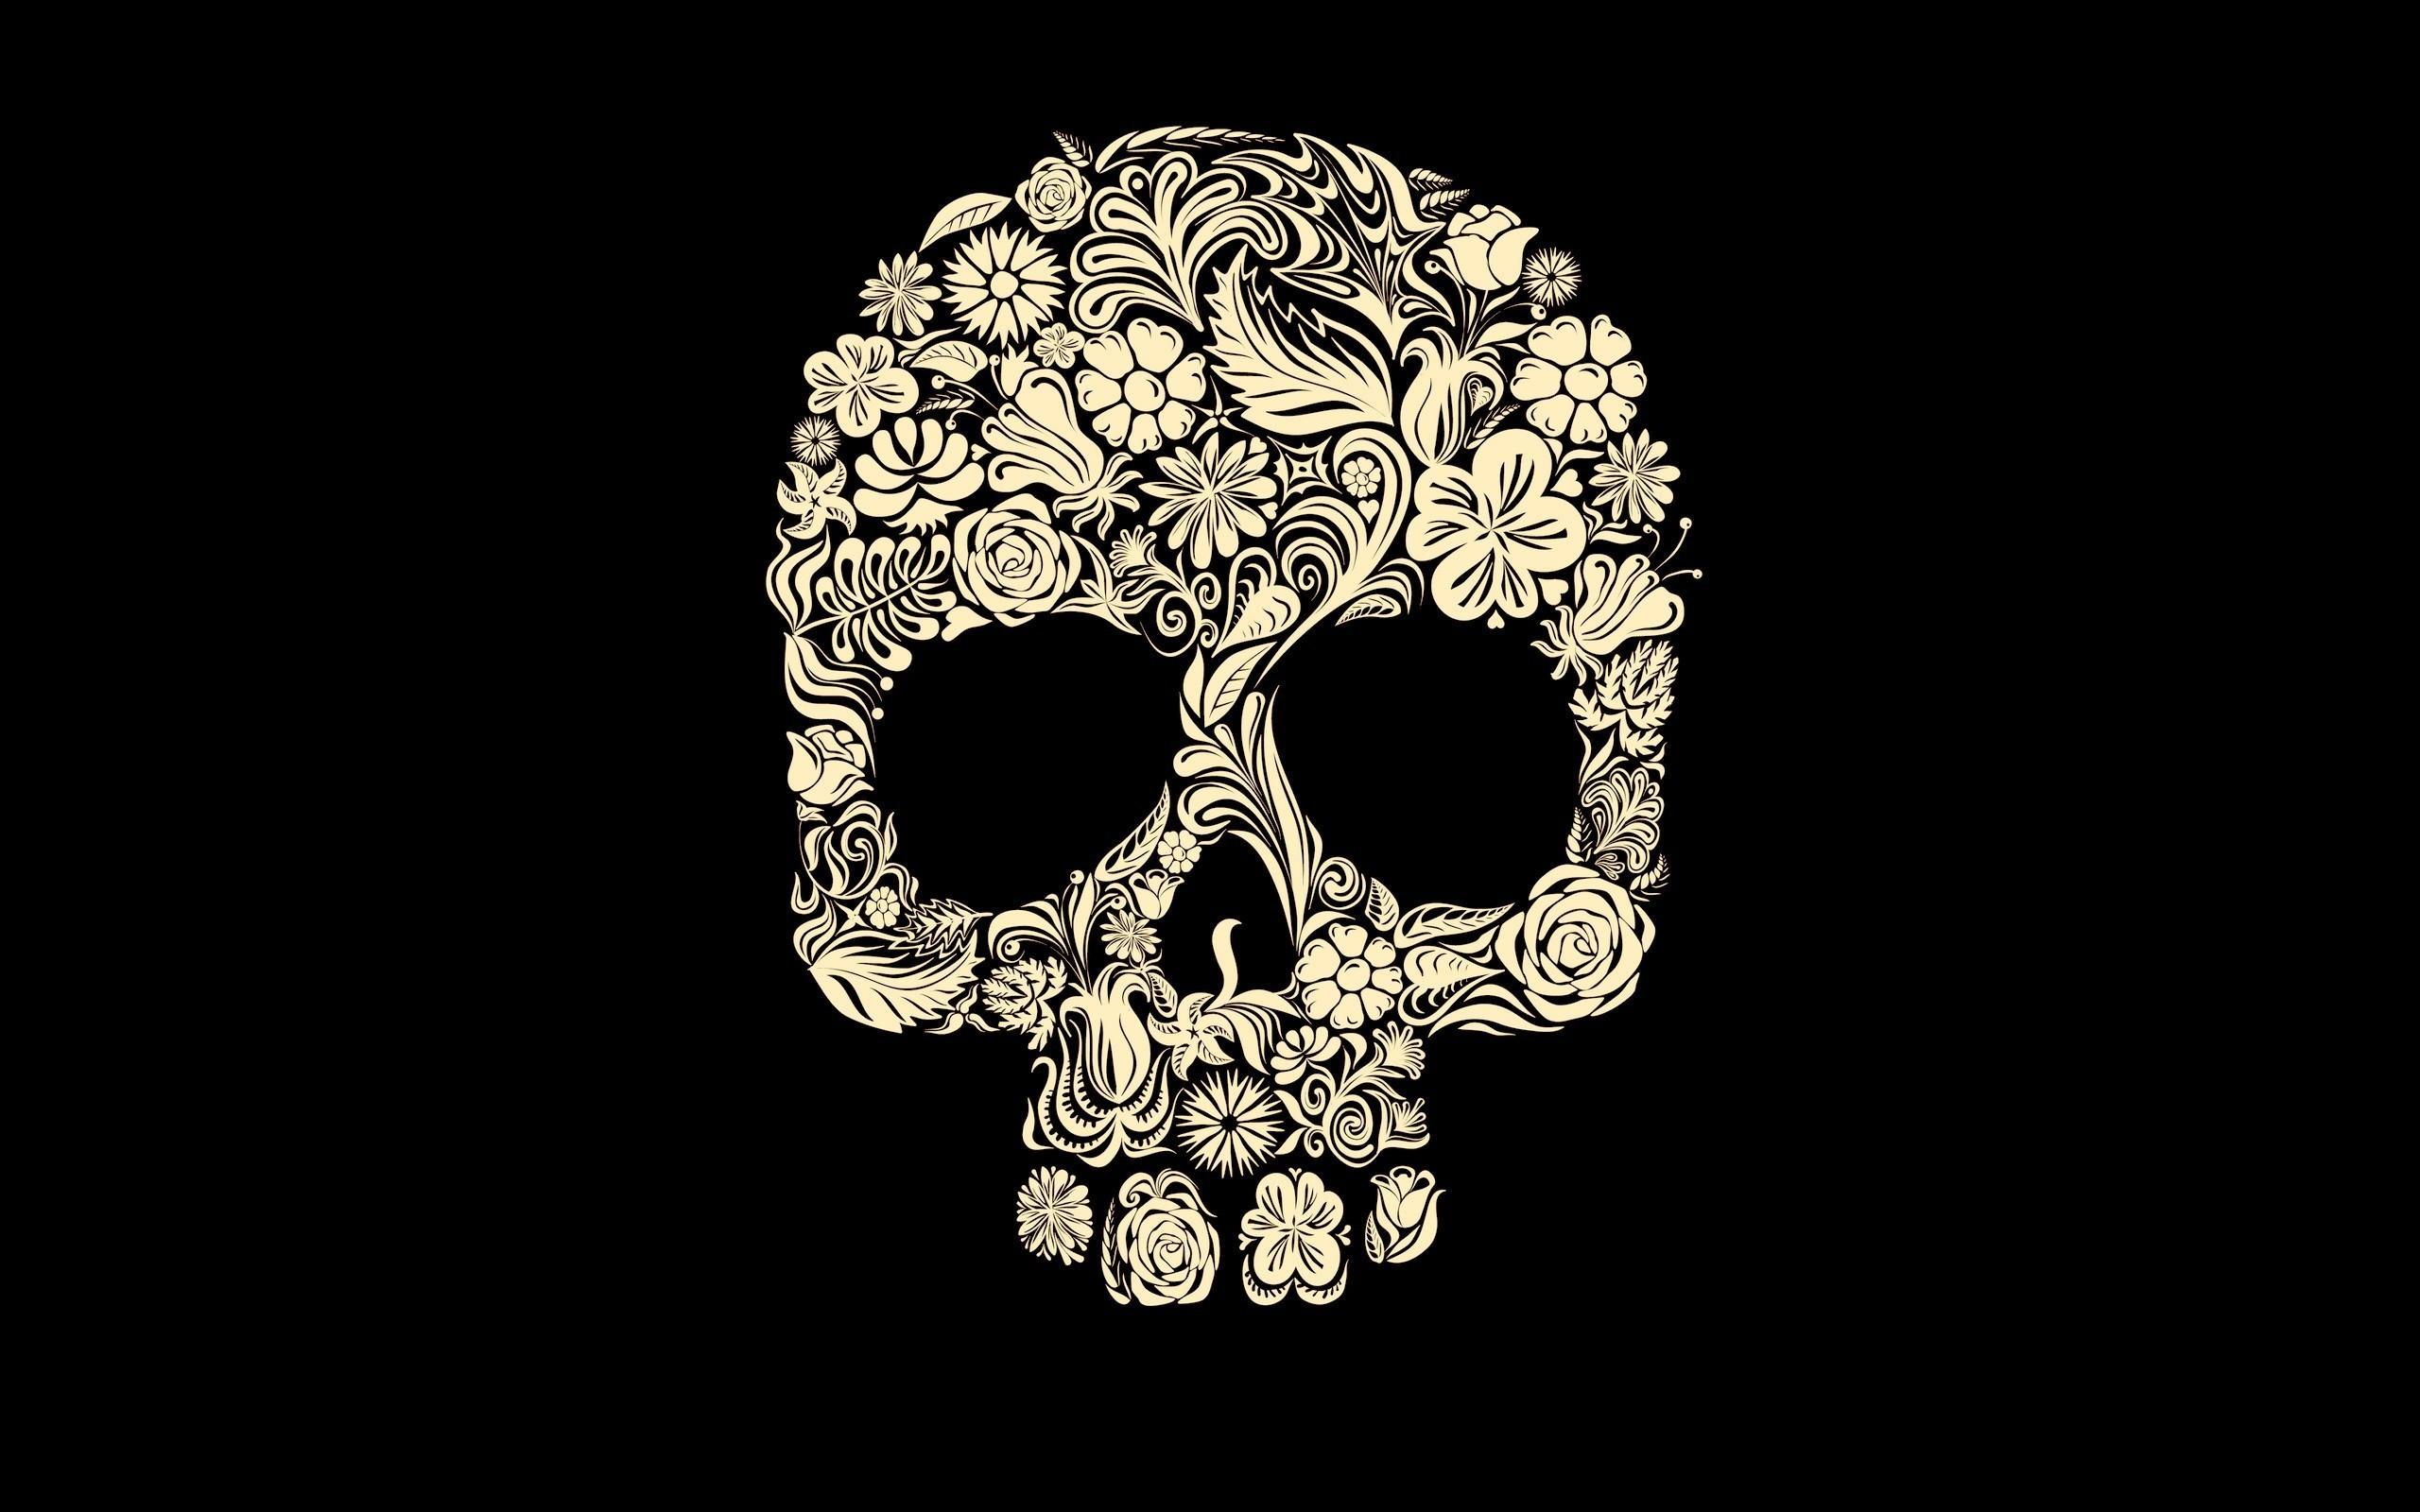 digital Art, Simple Background, Minimalism, Black Background, Skull,  Flowers, Leaves, Rose, Petals, Tulips, Death, Spooky, Gothic Wallpapers HD  / Desktop …